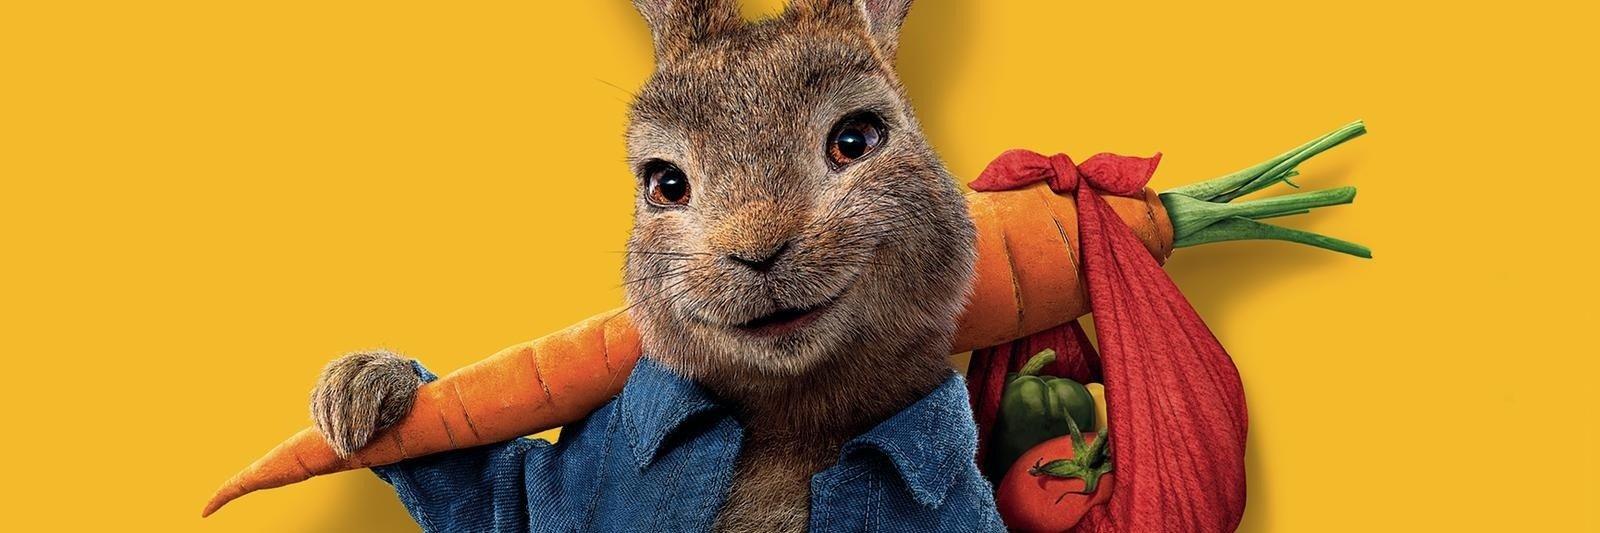 Przedstawiamy: Peter Rabbit 2: The Runaway (Original Motion Picture Score)